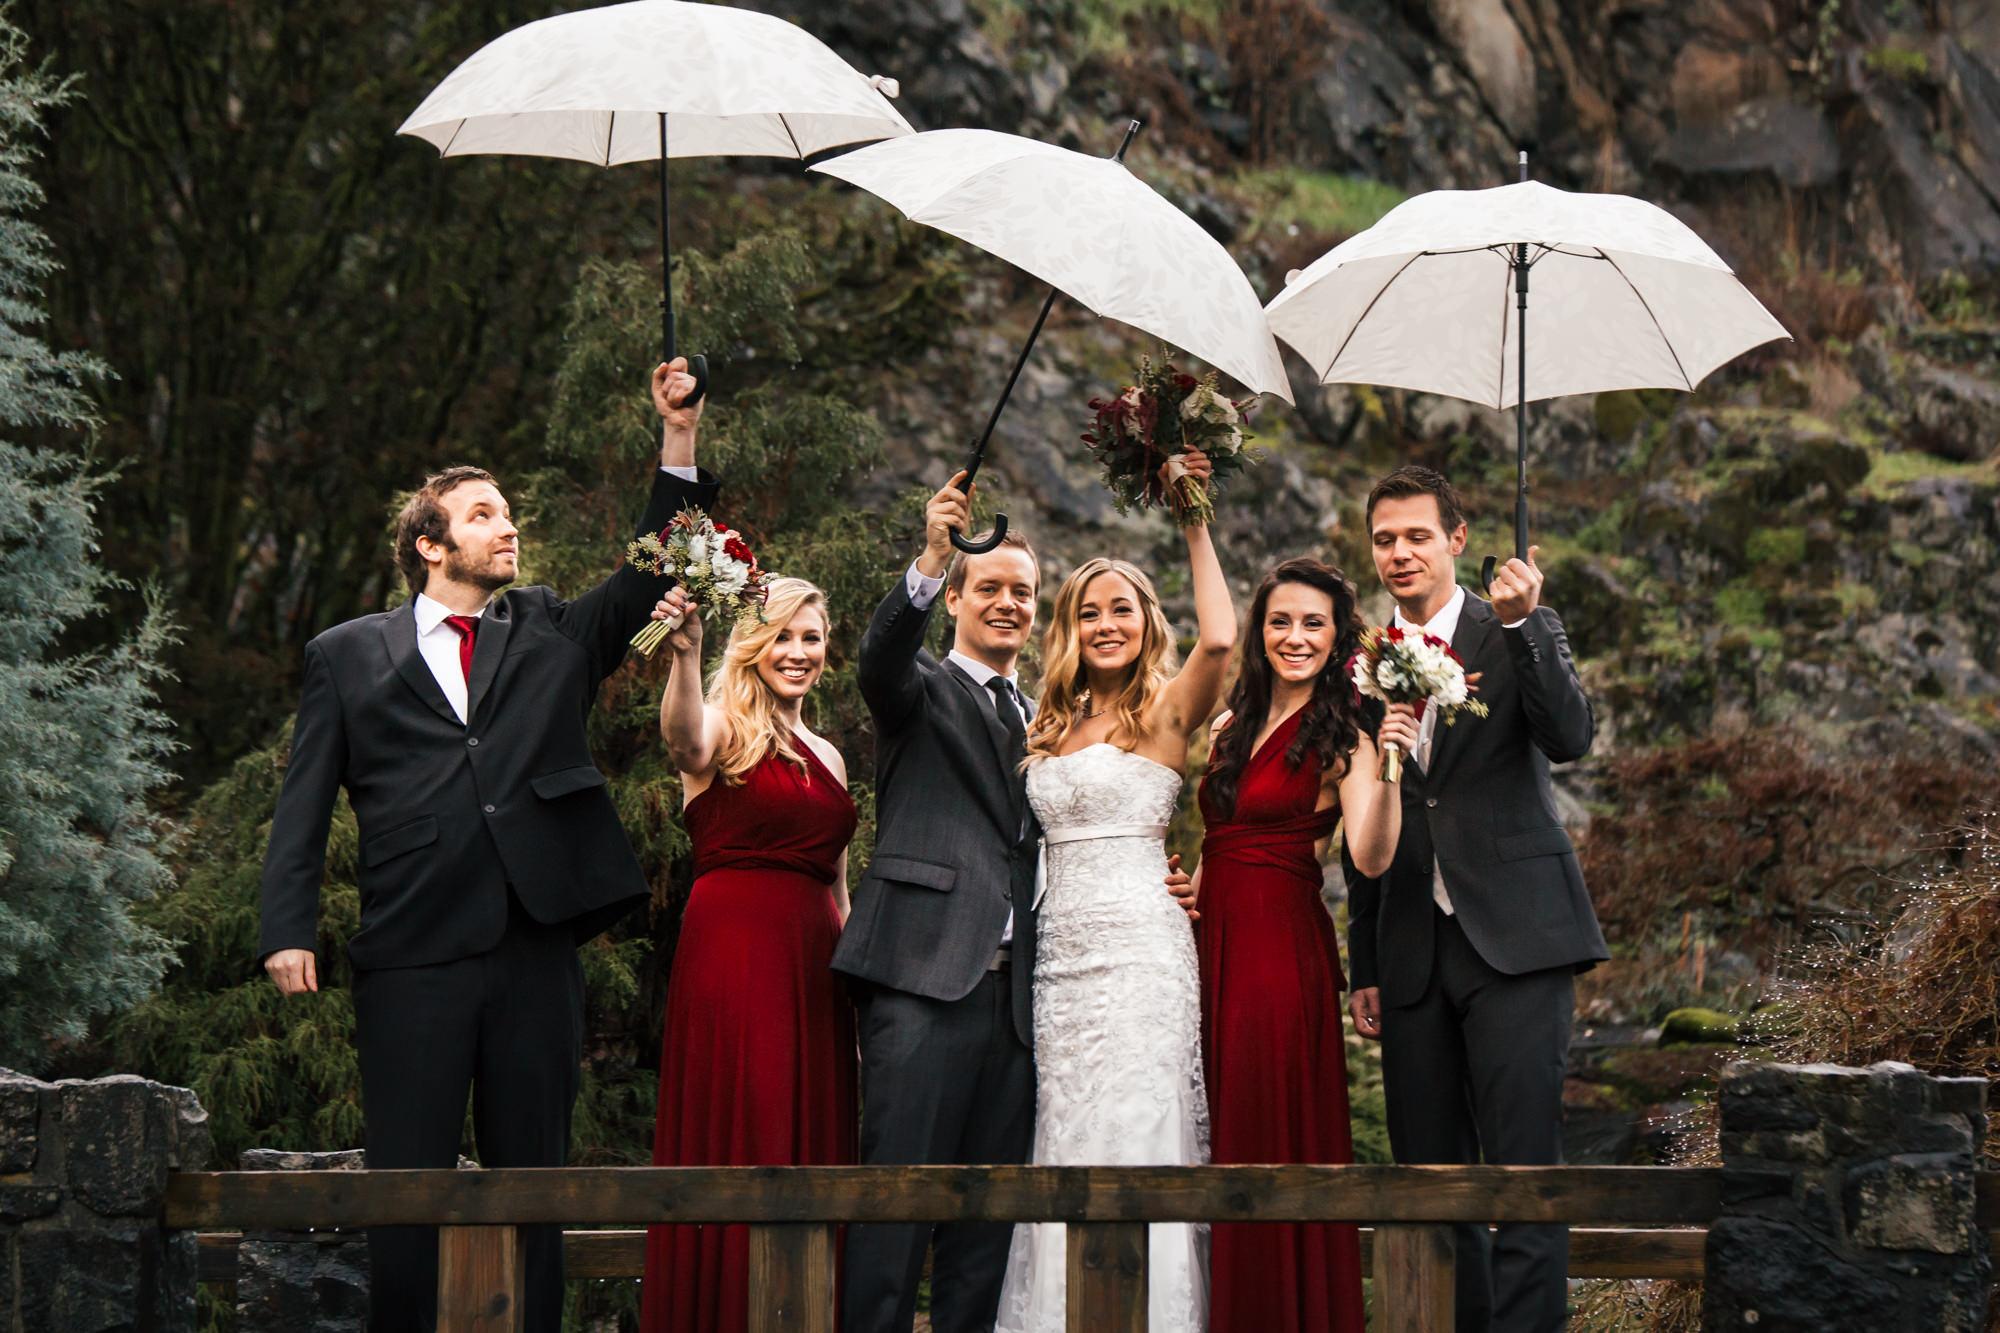 19-queen-elizabeth-park-qepark-wedding-party-umbrella.jpg